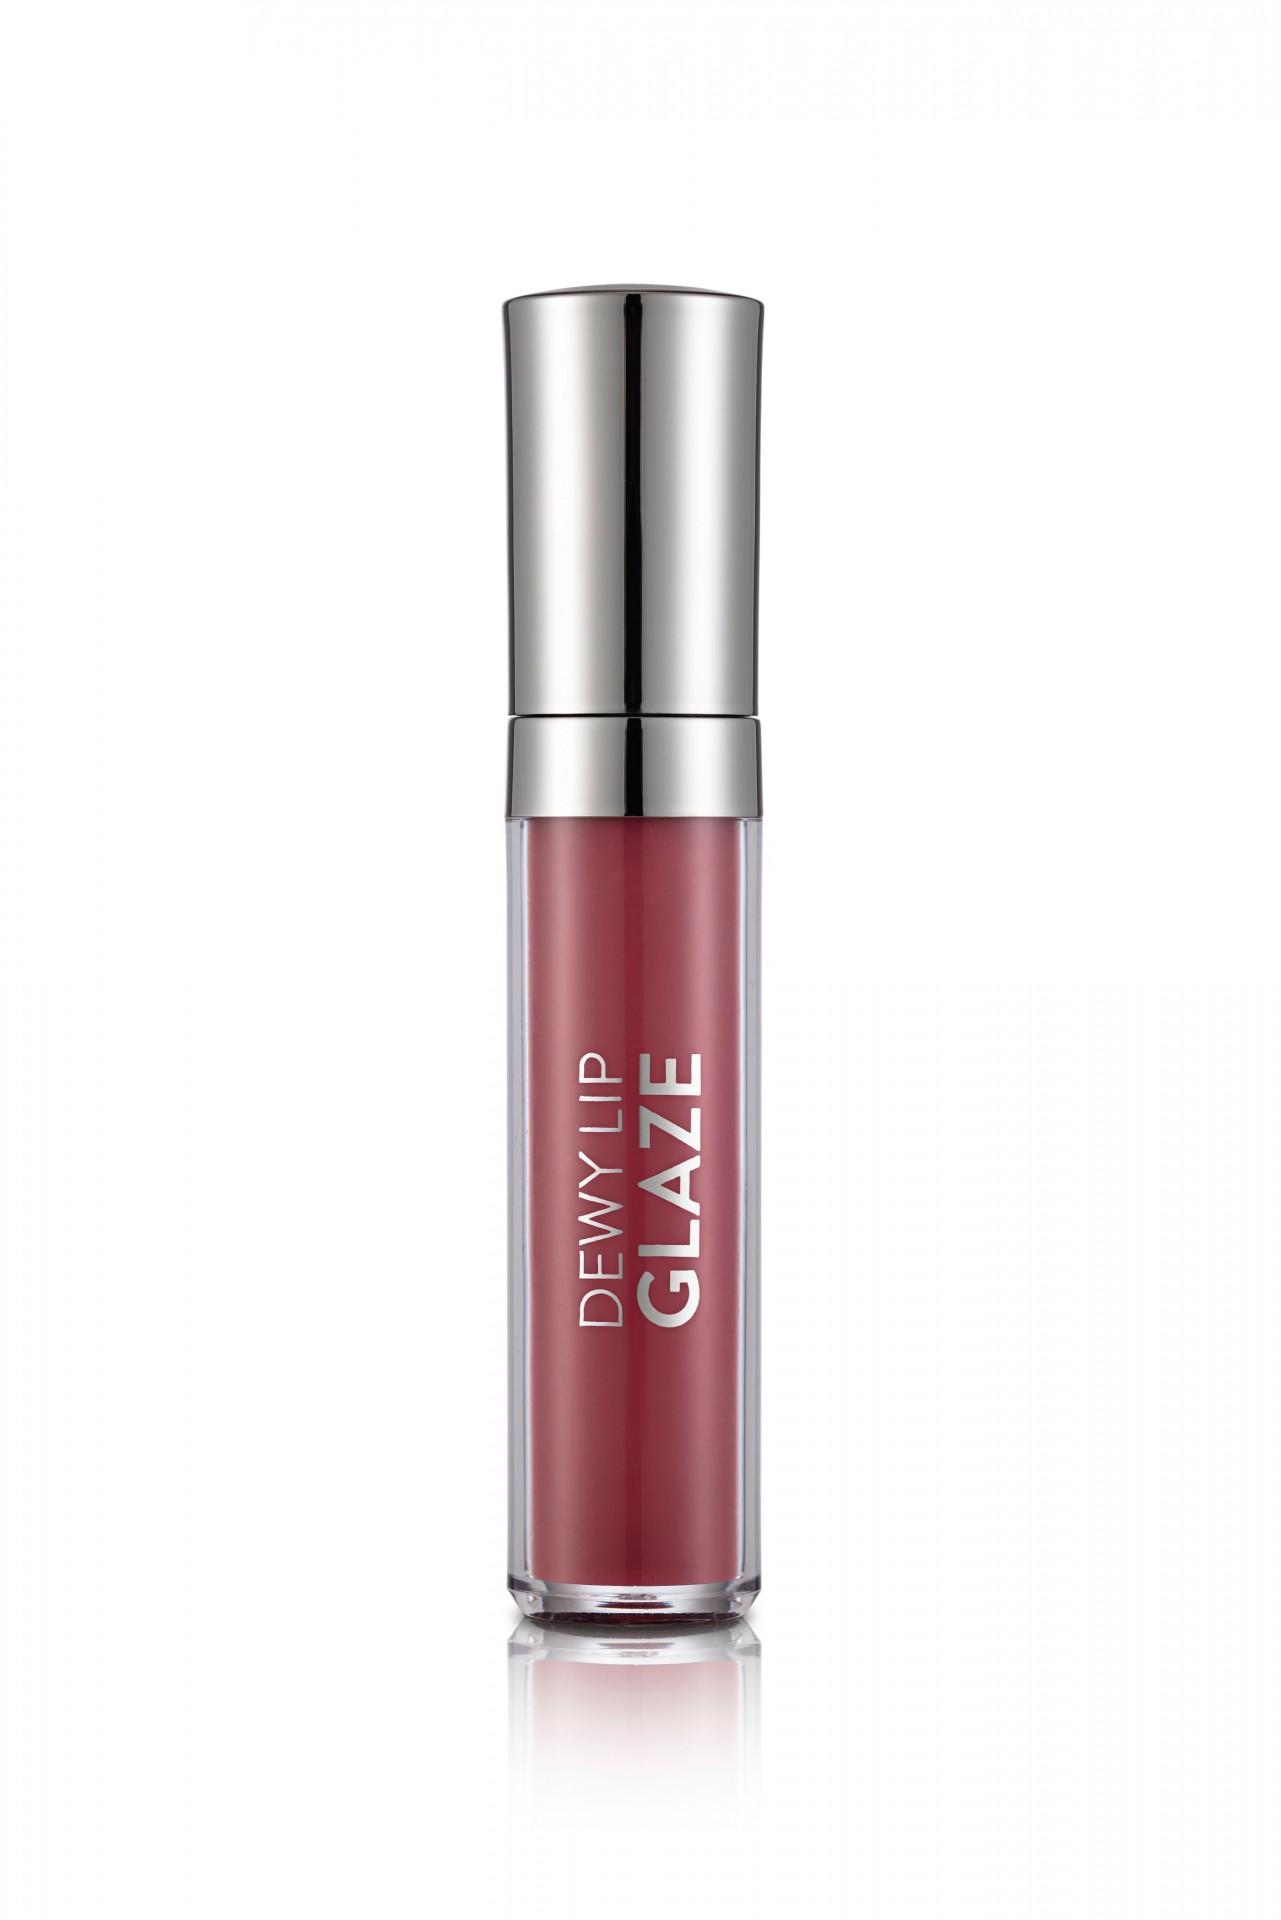 FLORMAR DEWY LIP GLAZE 17-Elegant Pink